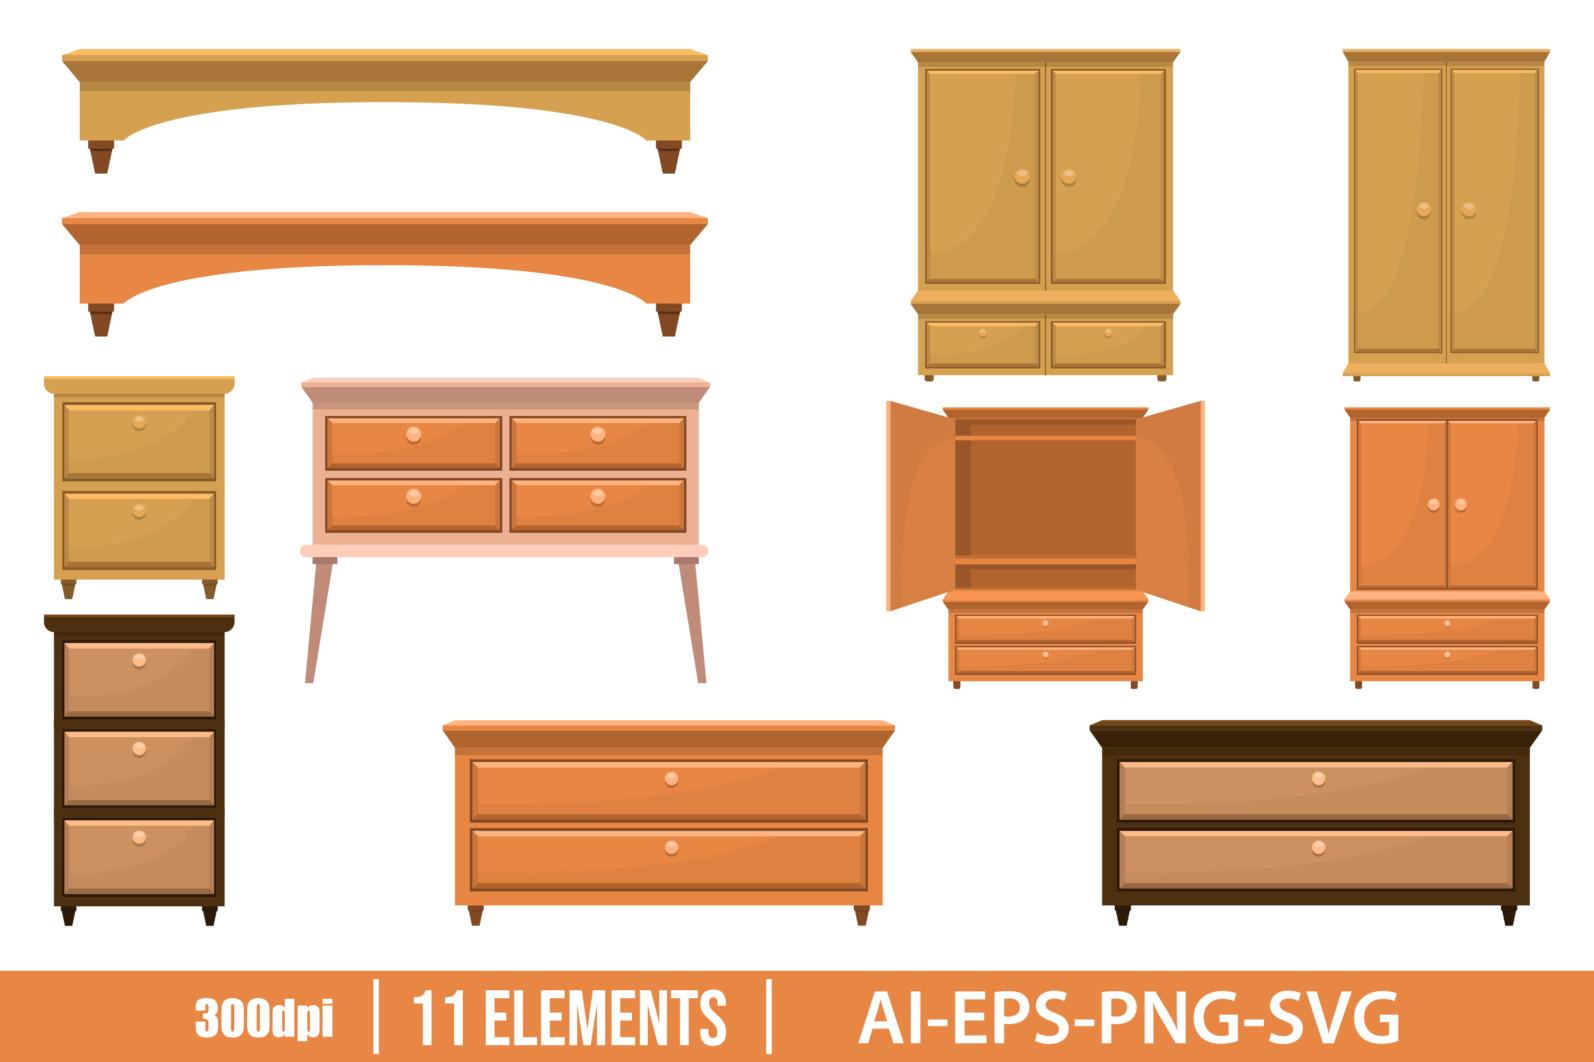 Retro wooden bedroom furniture clipart vector design illustration. Vector Clipart Print - FURNITURE scaled -